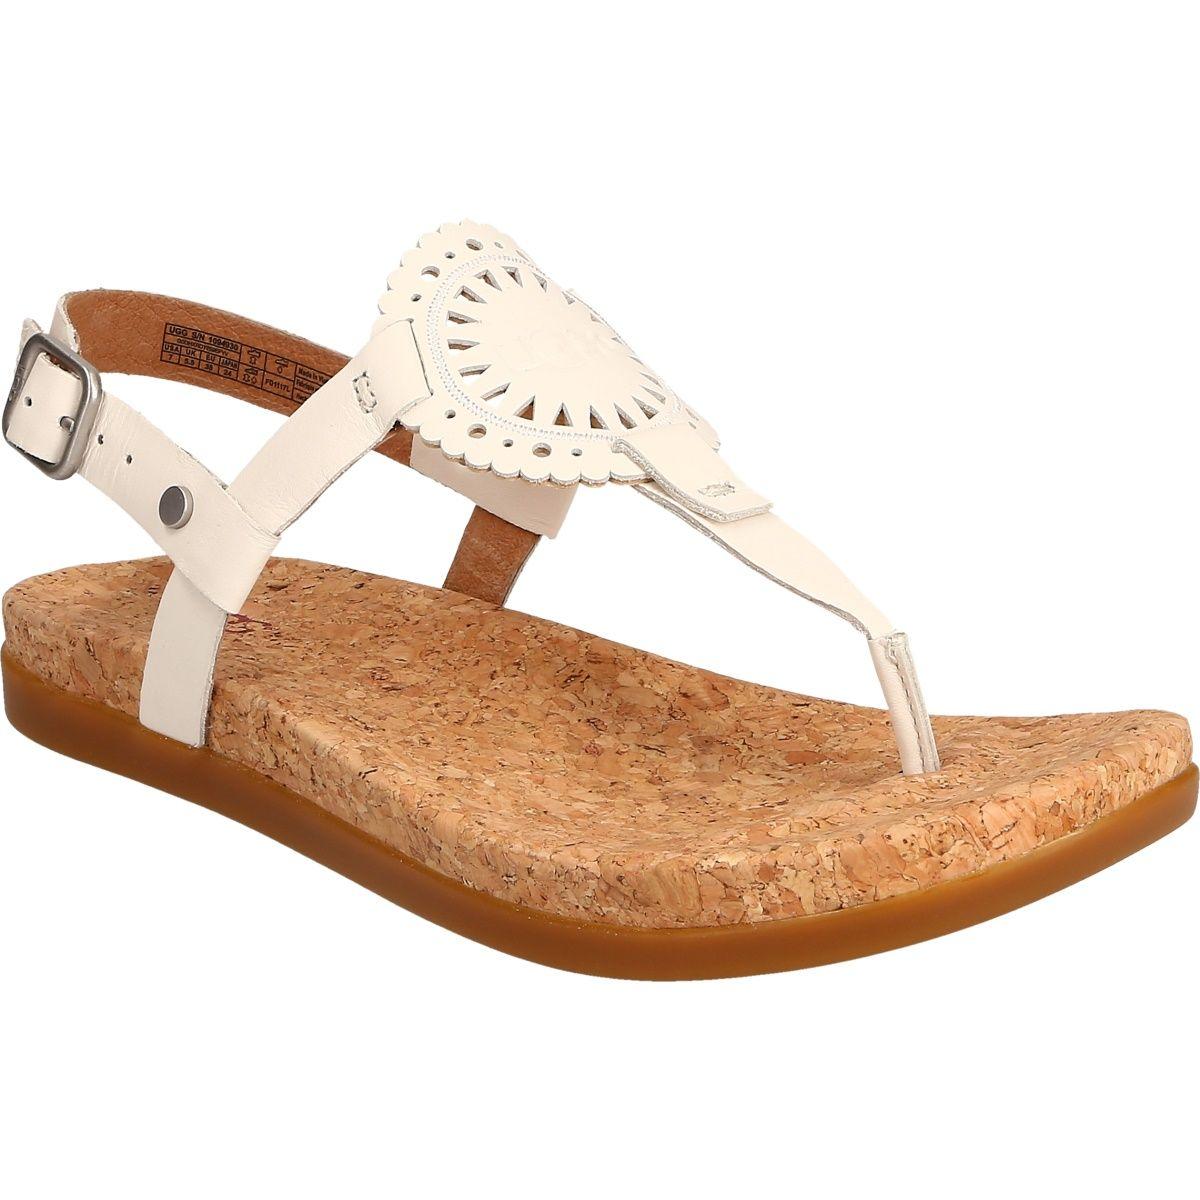 Ugg boots schweiz online shop